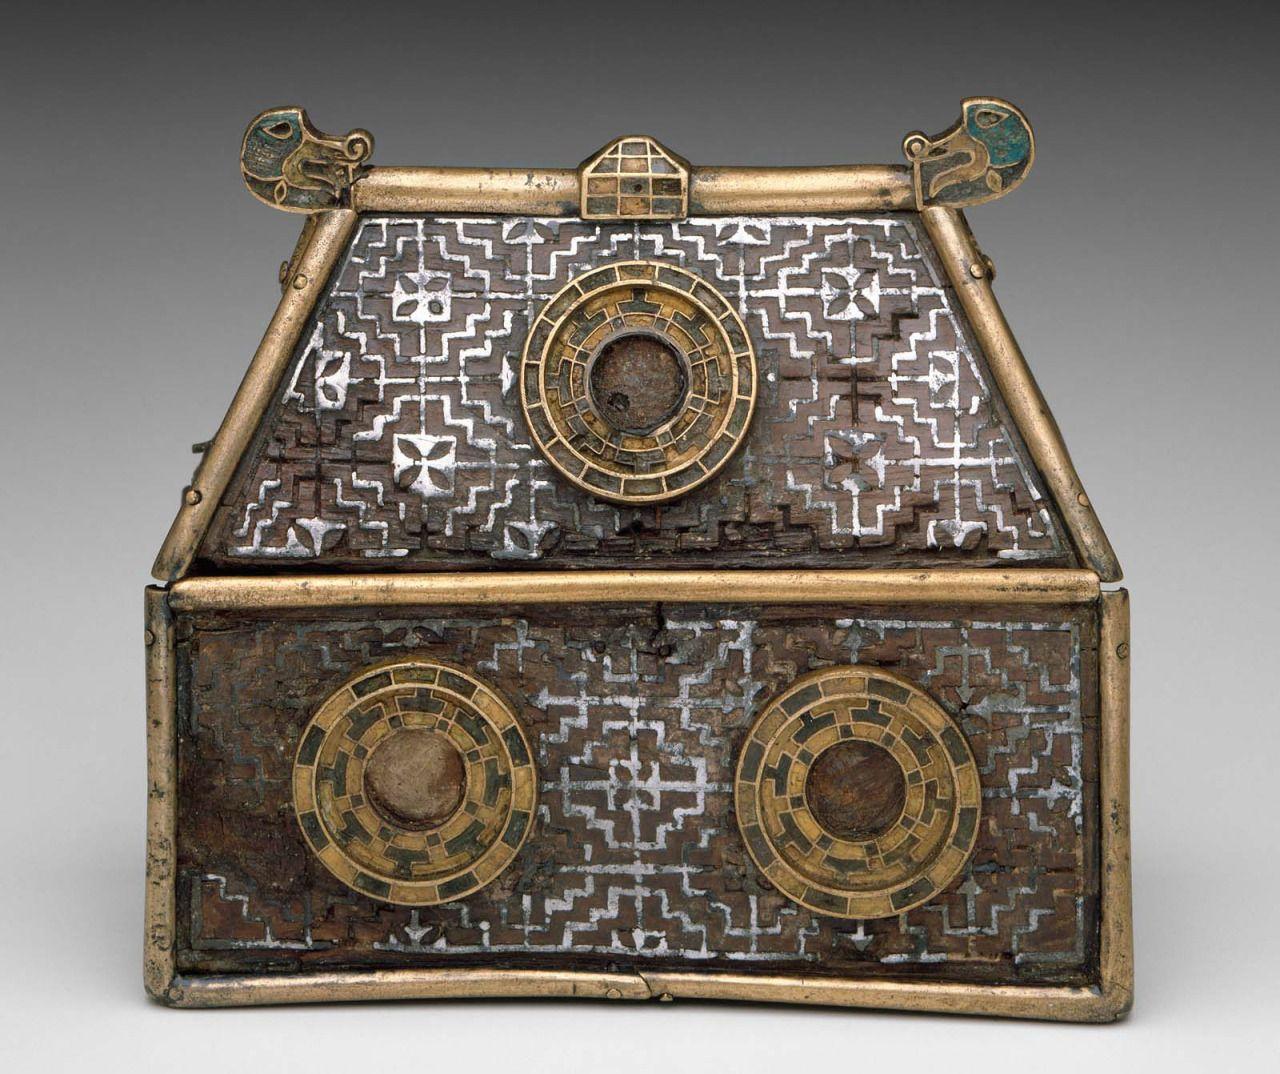 Emly Shrine - Irish Reliquary Casket Late 7th